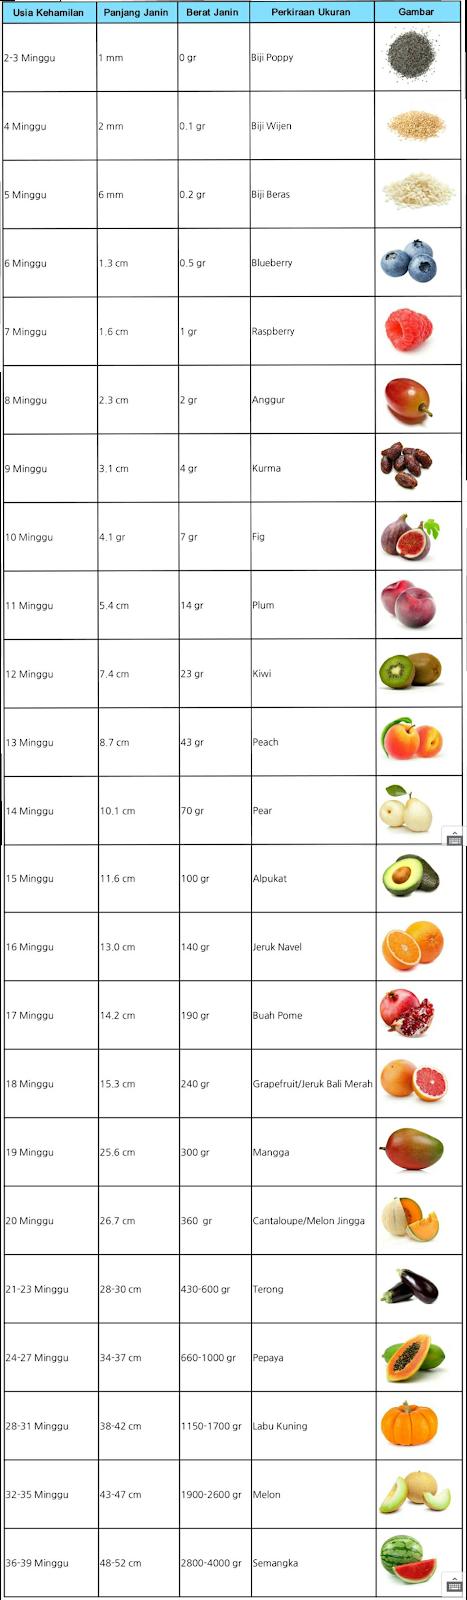 Ukuran normal berat badan janin